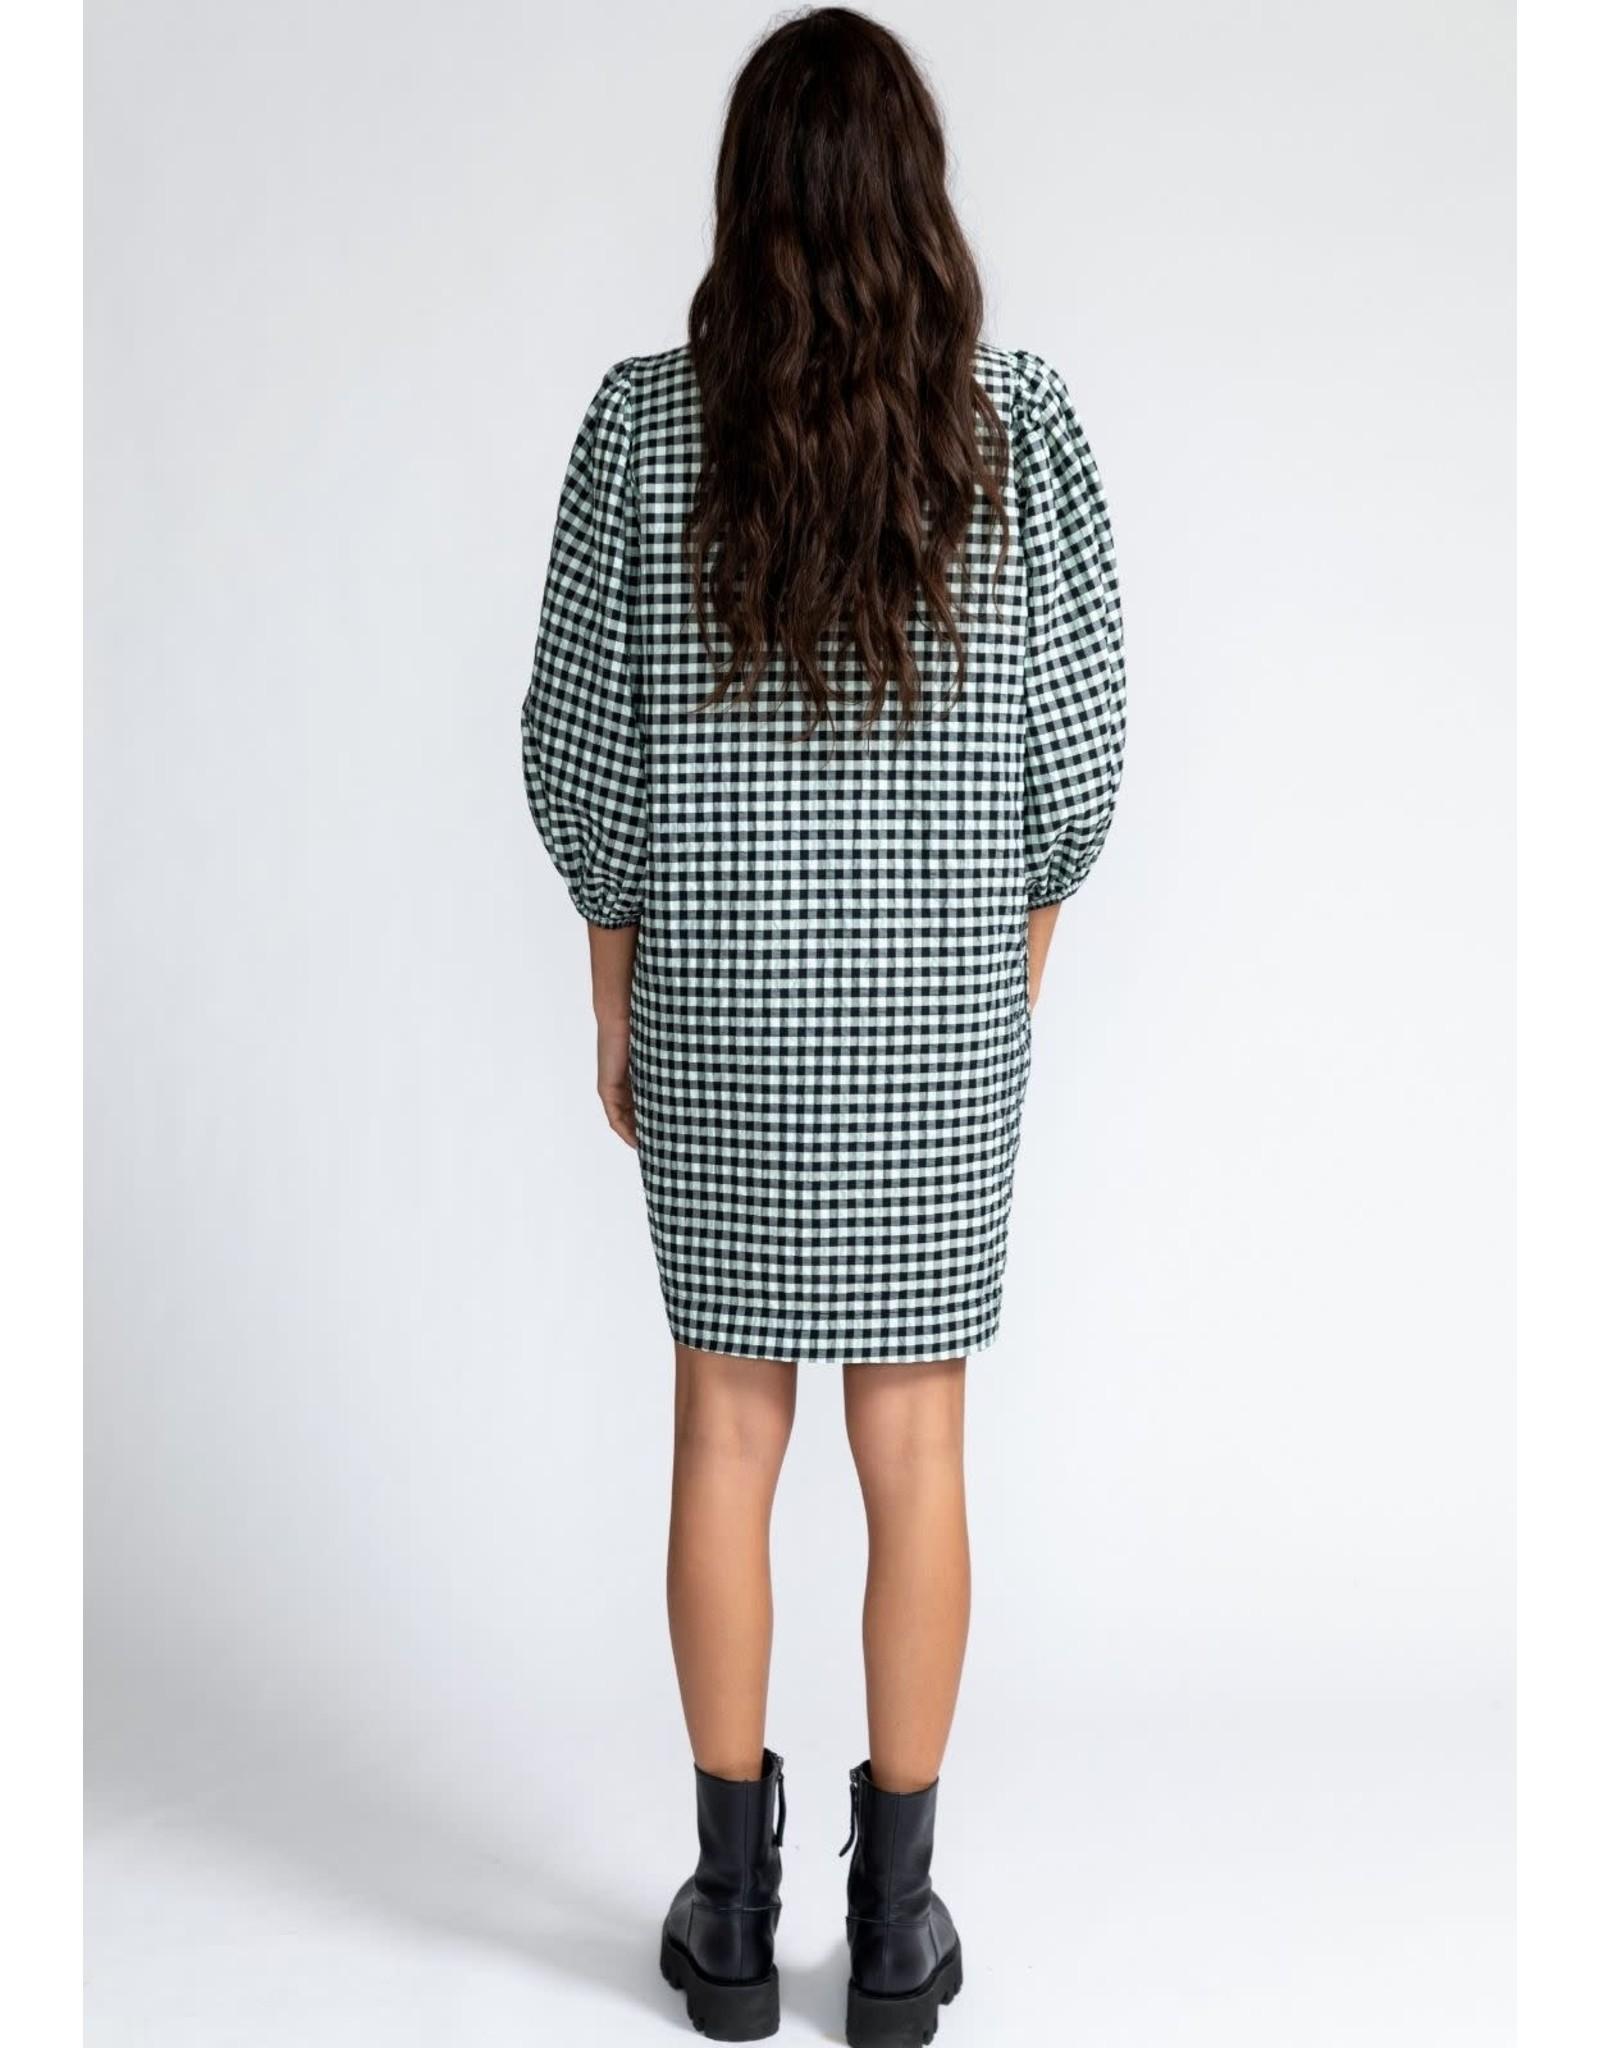 LIV THE LABEL SHORT DRESS MINT